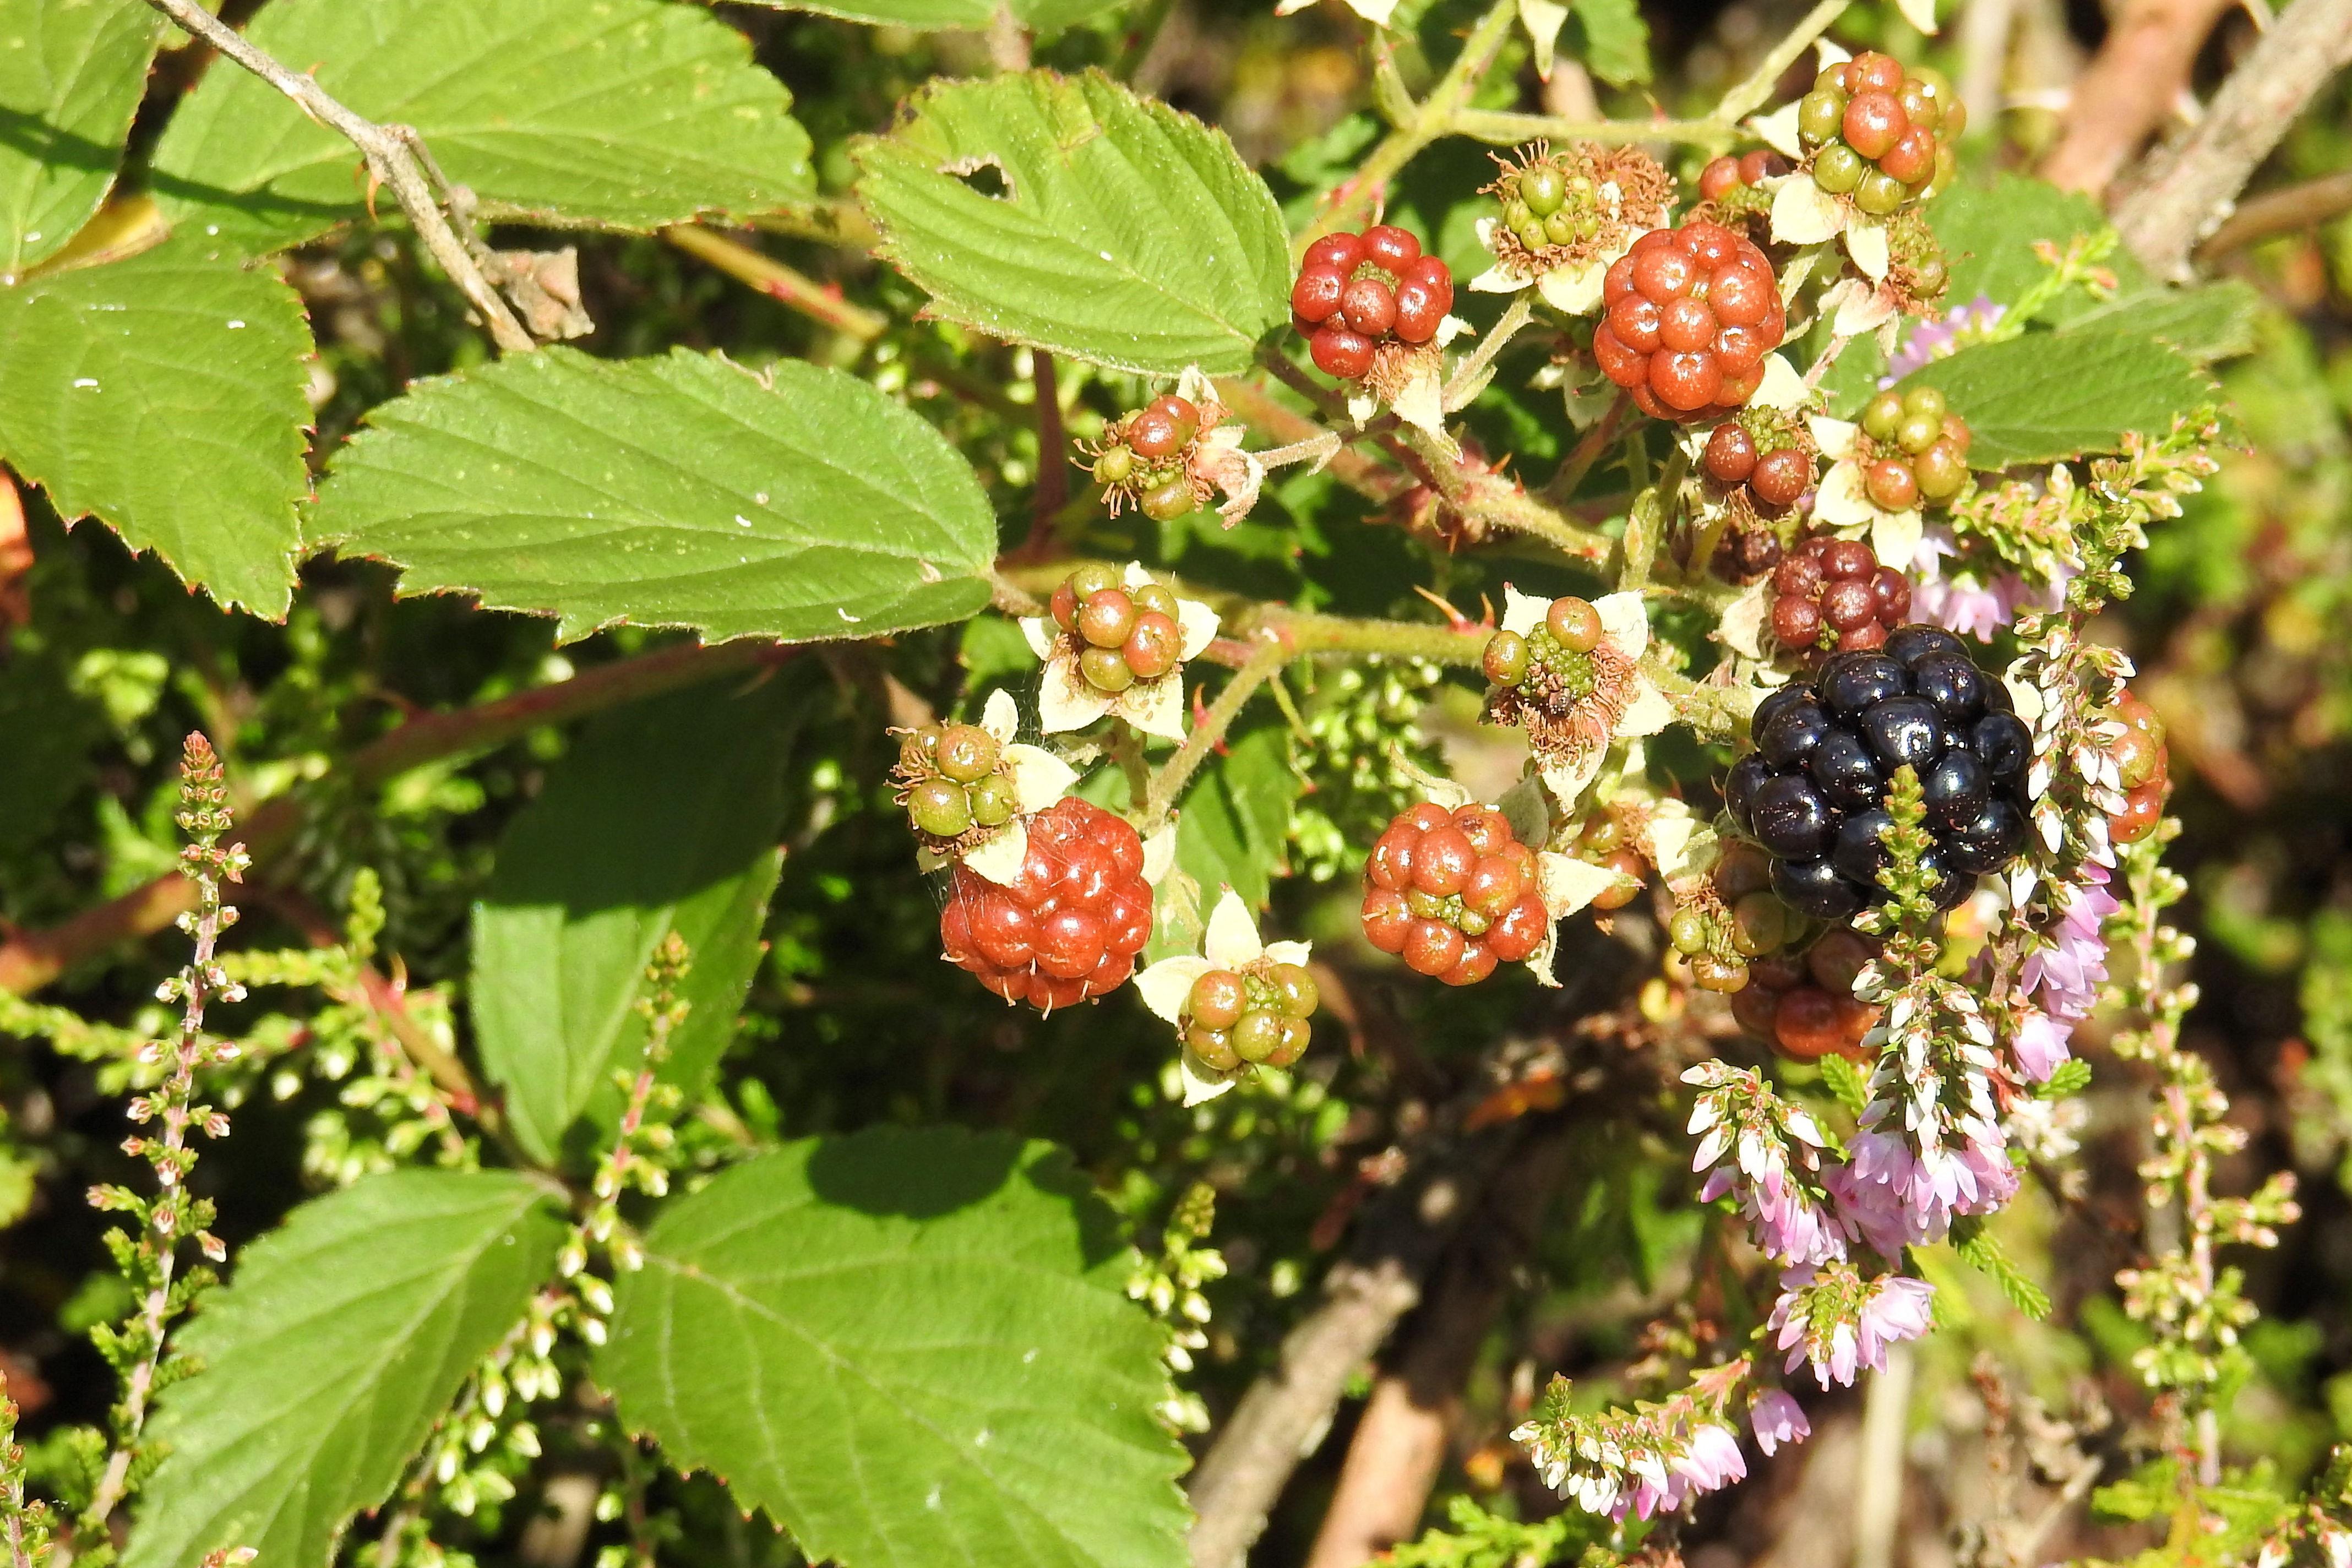 62 Gambar Pohon Anggur Hutan HD